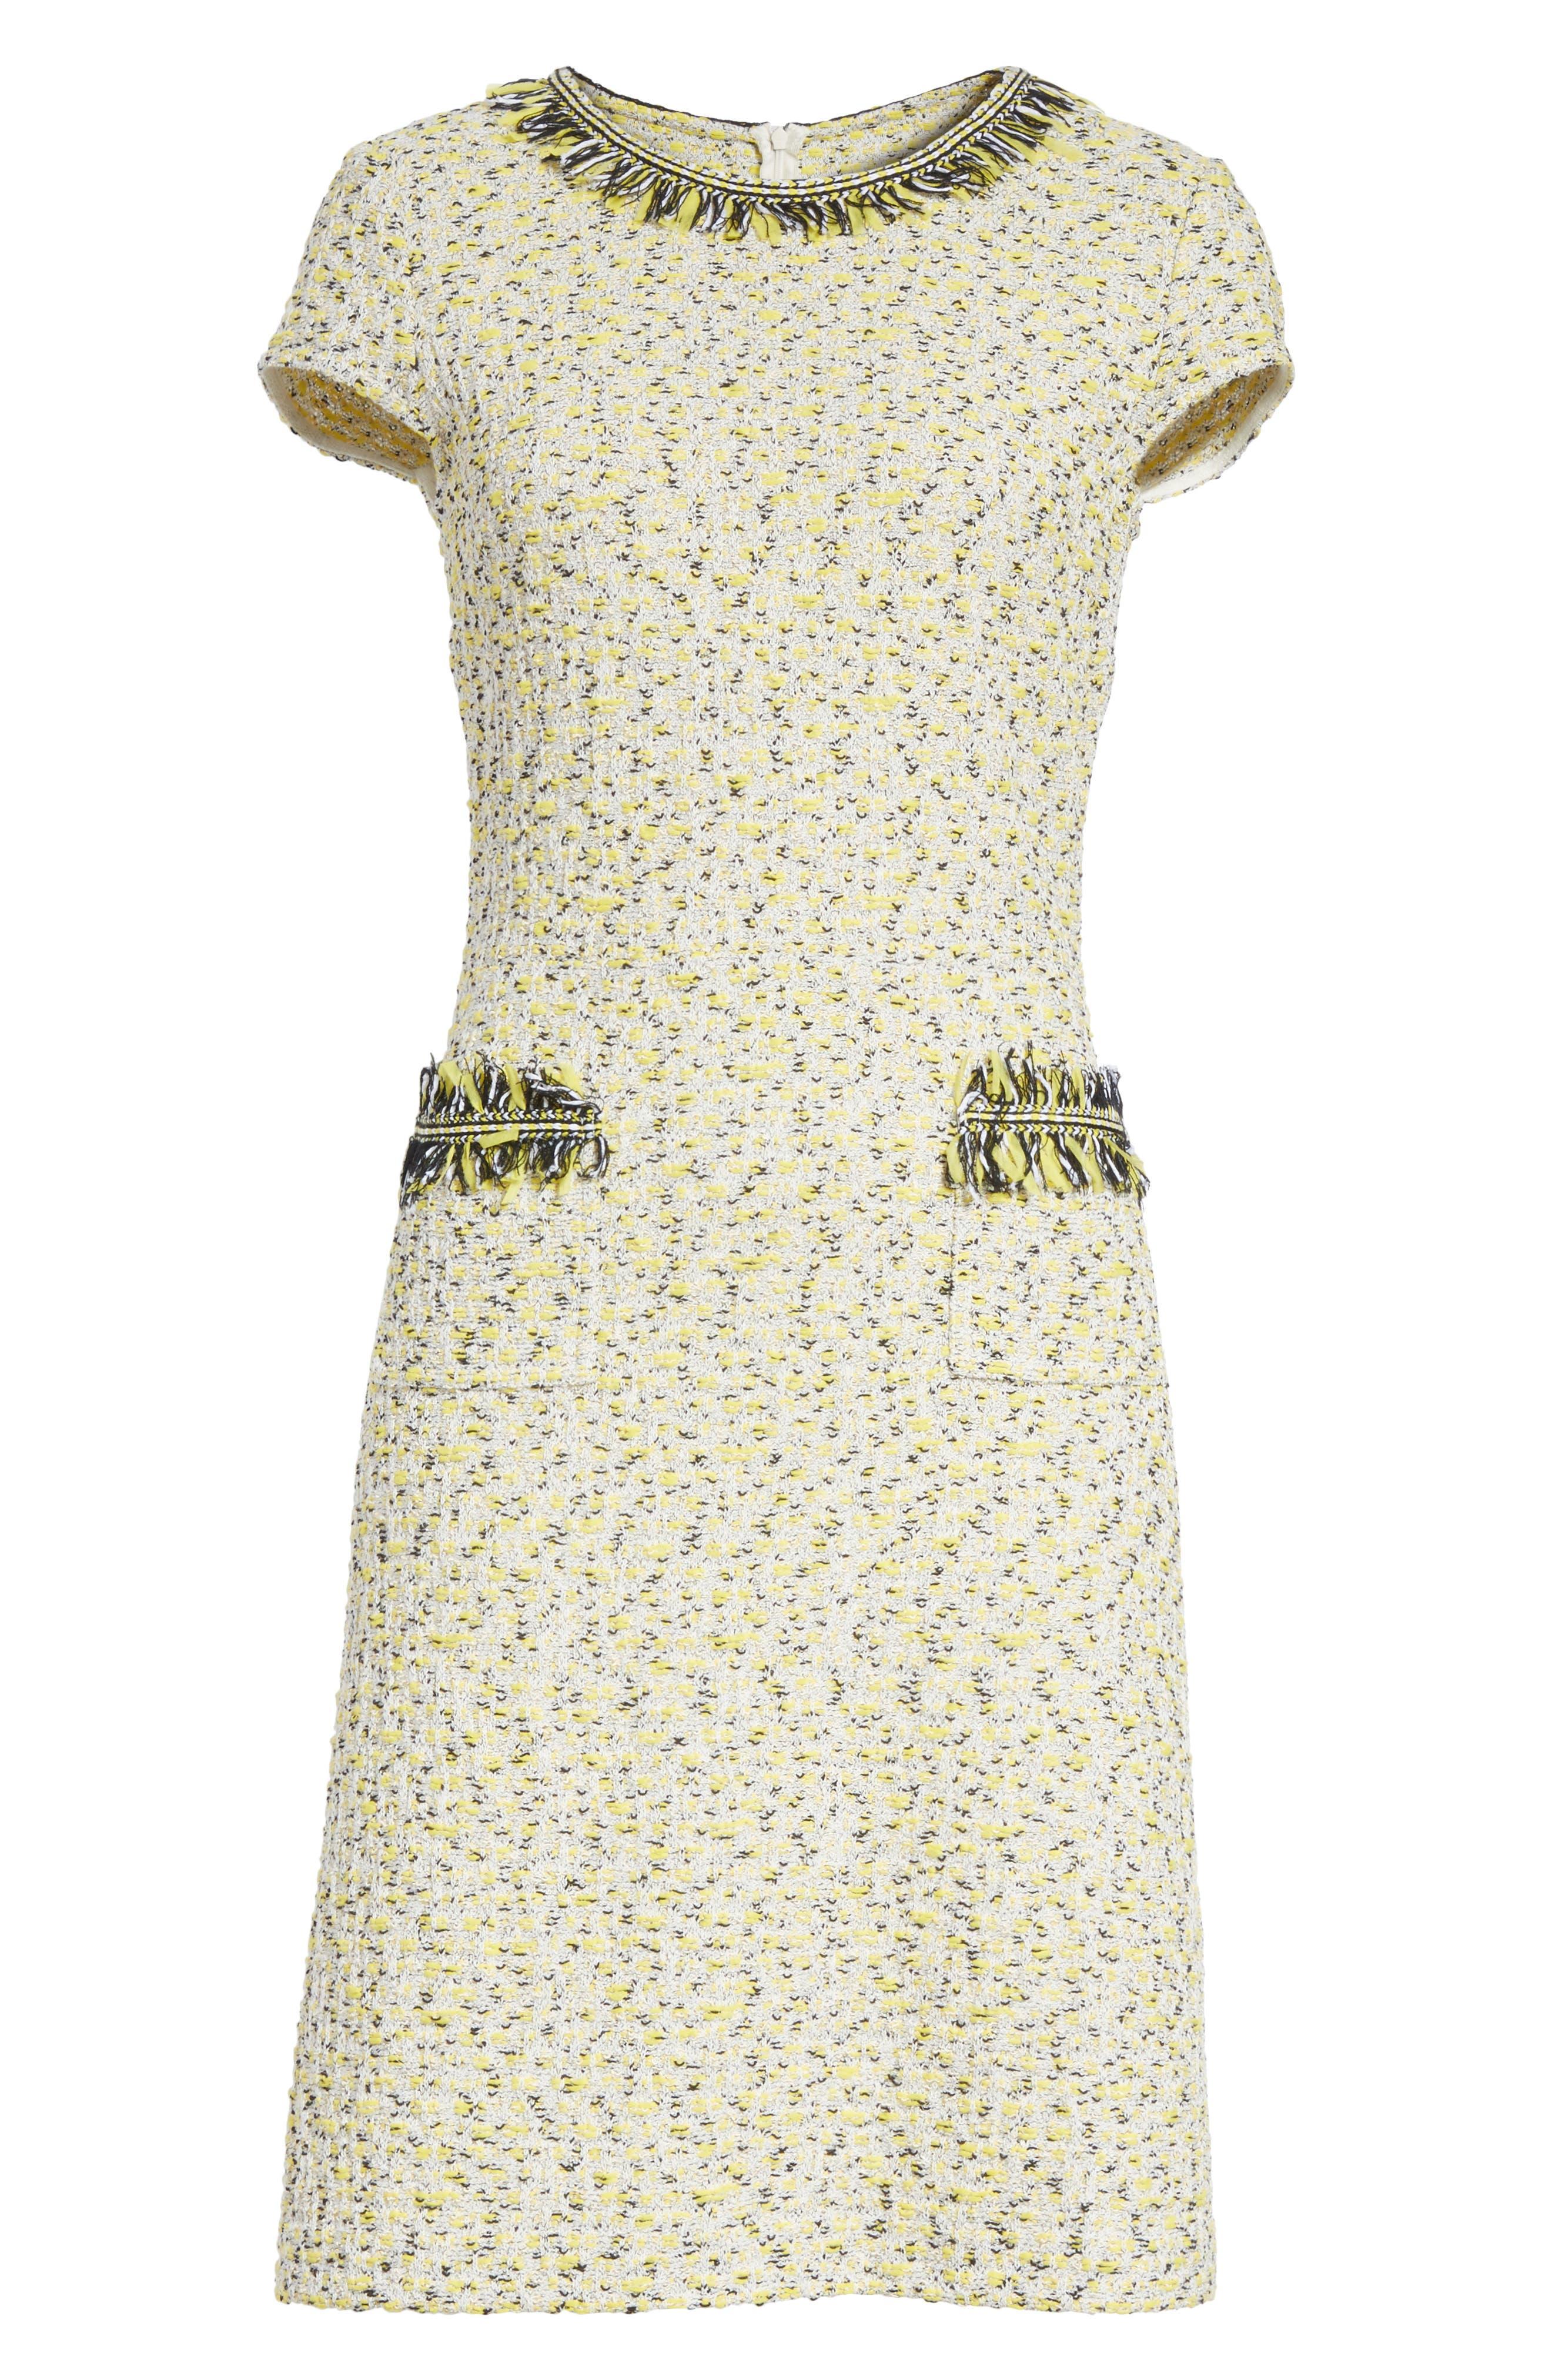 Romee Tweed Dress,                             Alternate thumbnail 7, color,                             Citron Multi